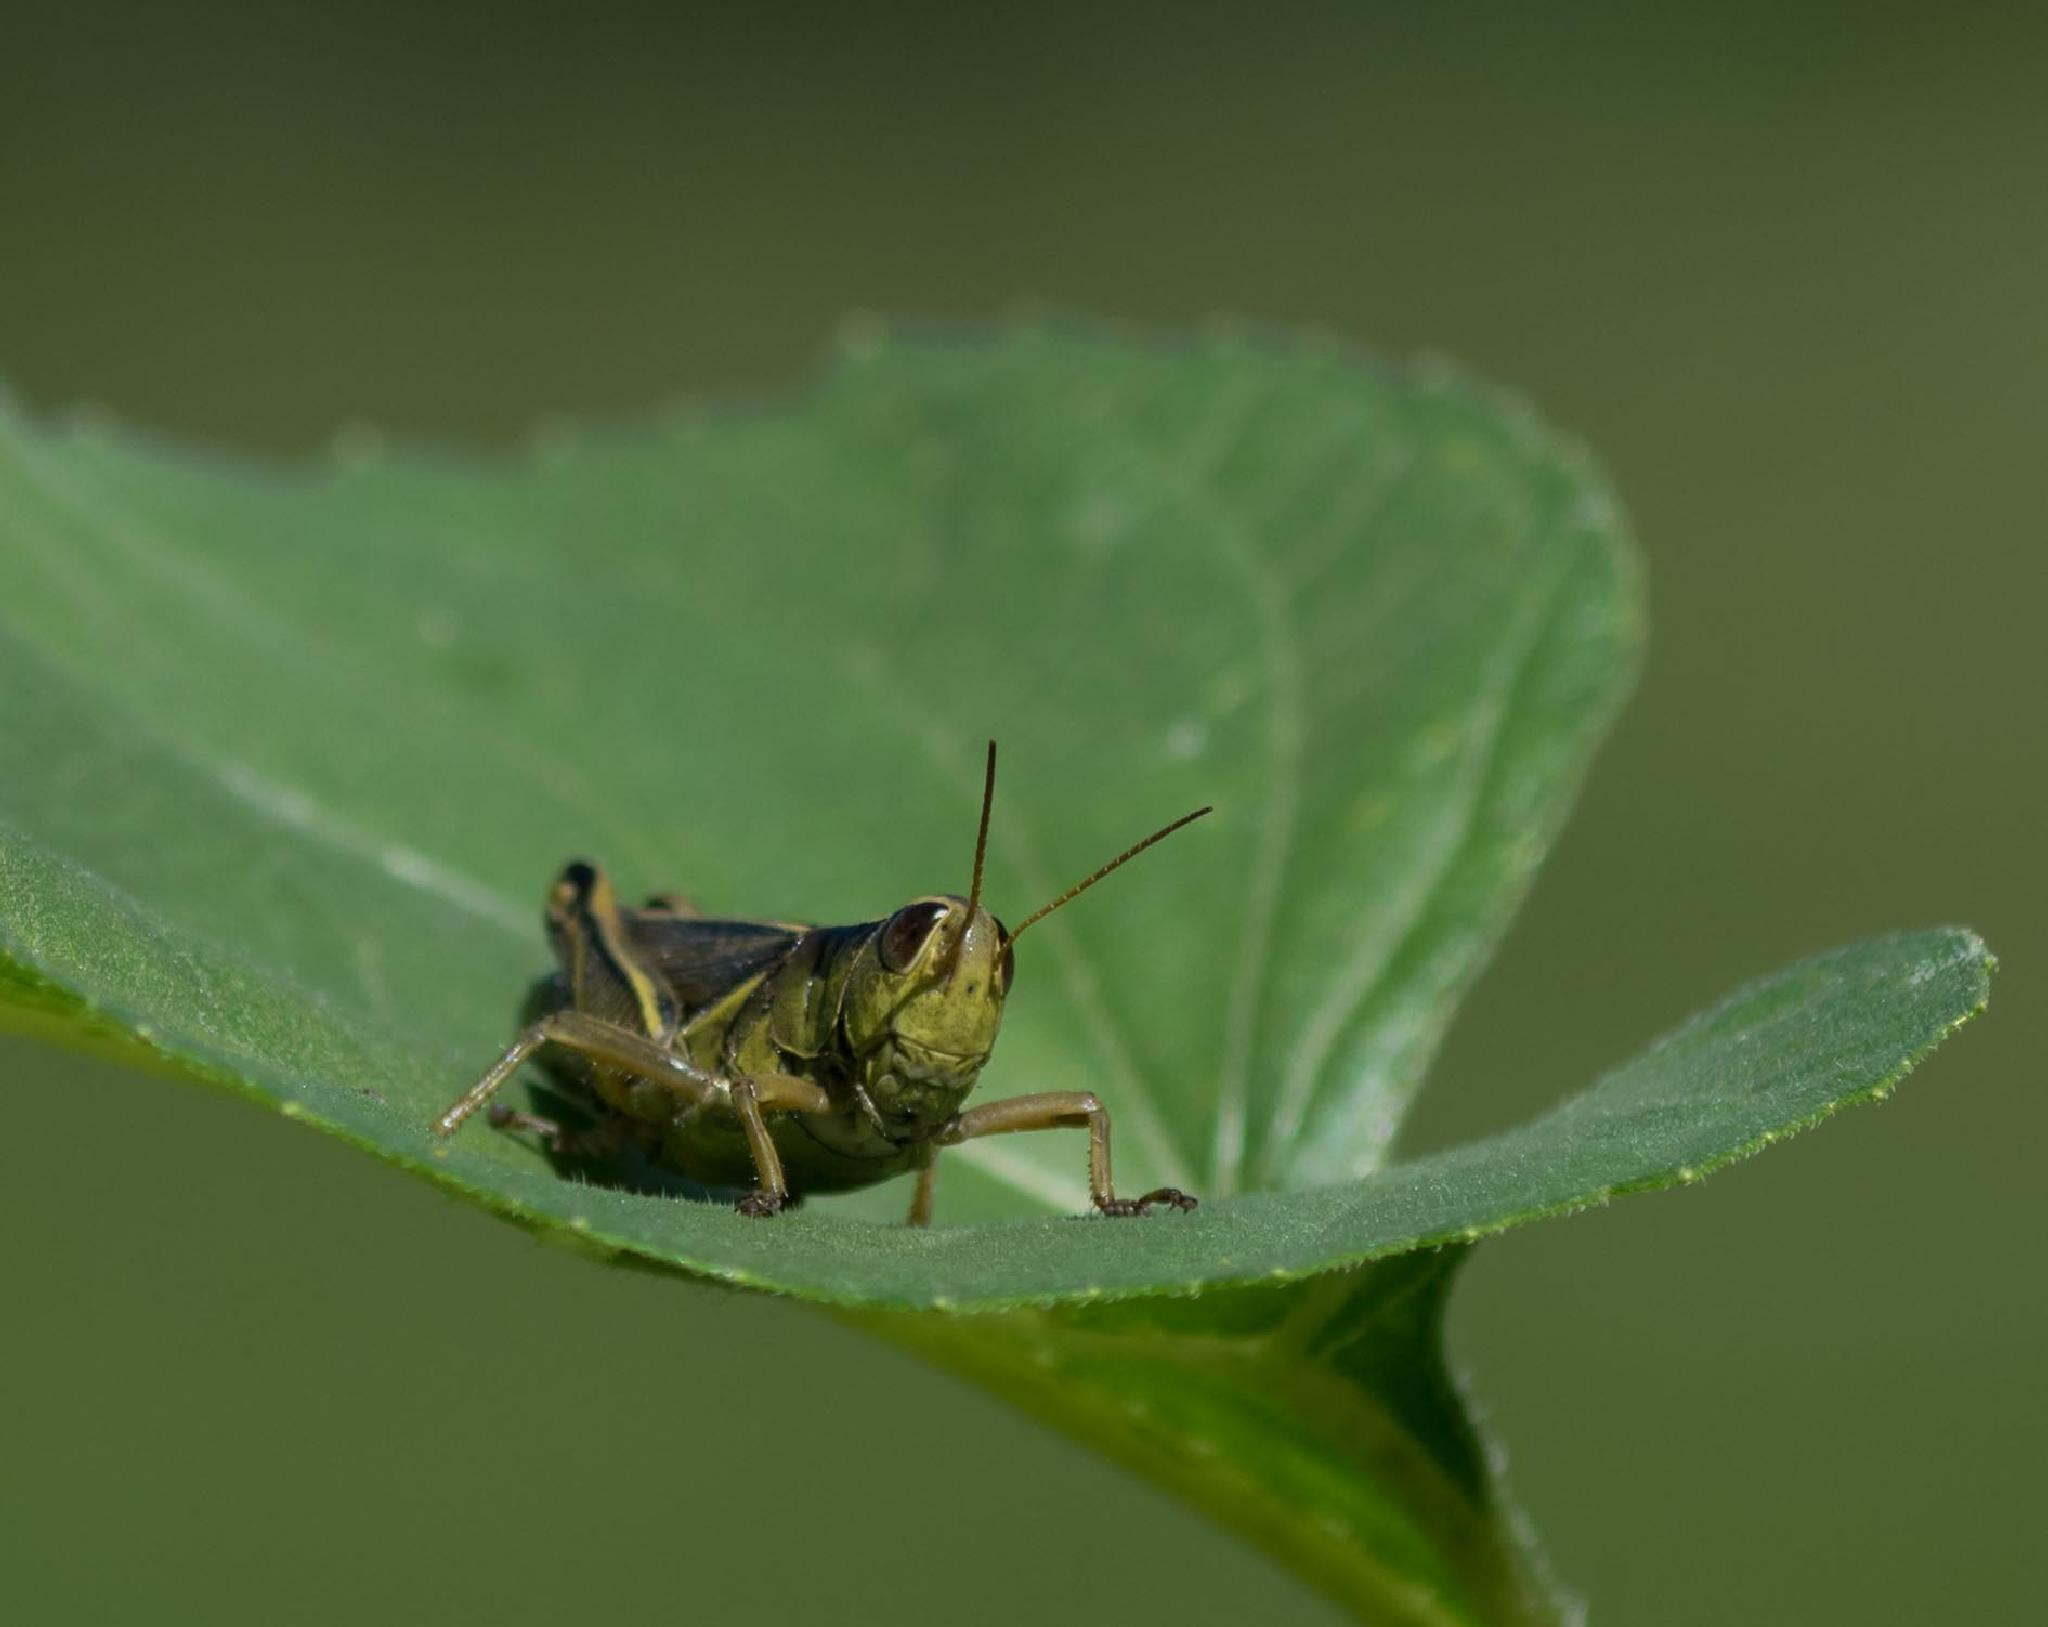 Plague of Locusts by DrJohnHodgson